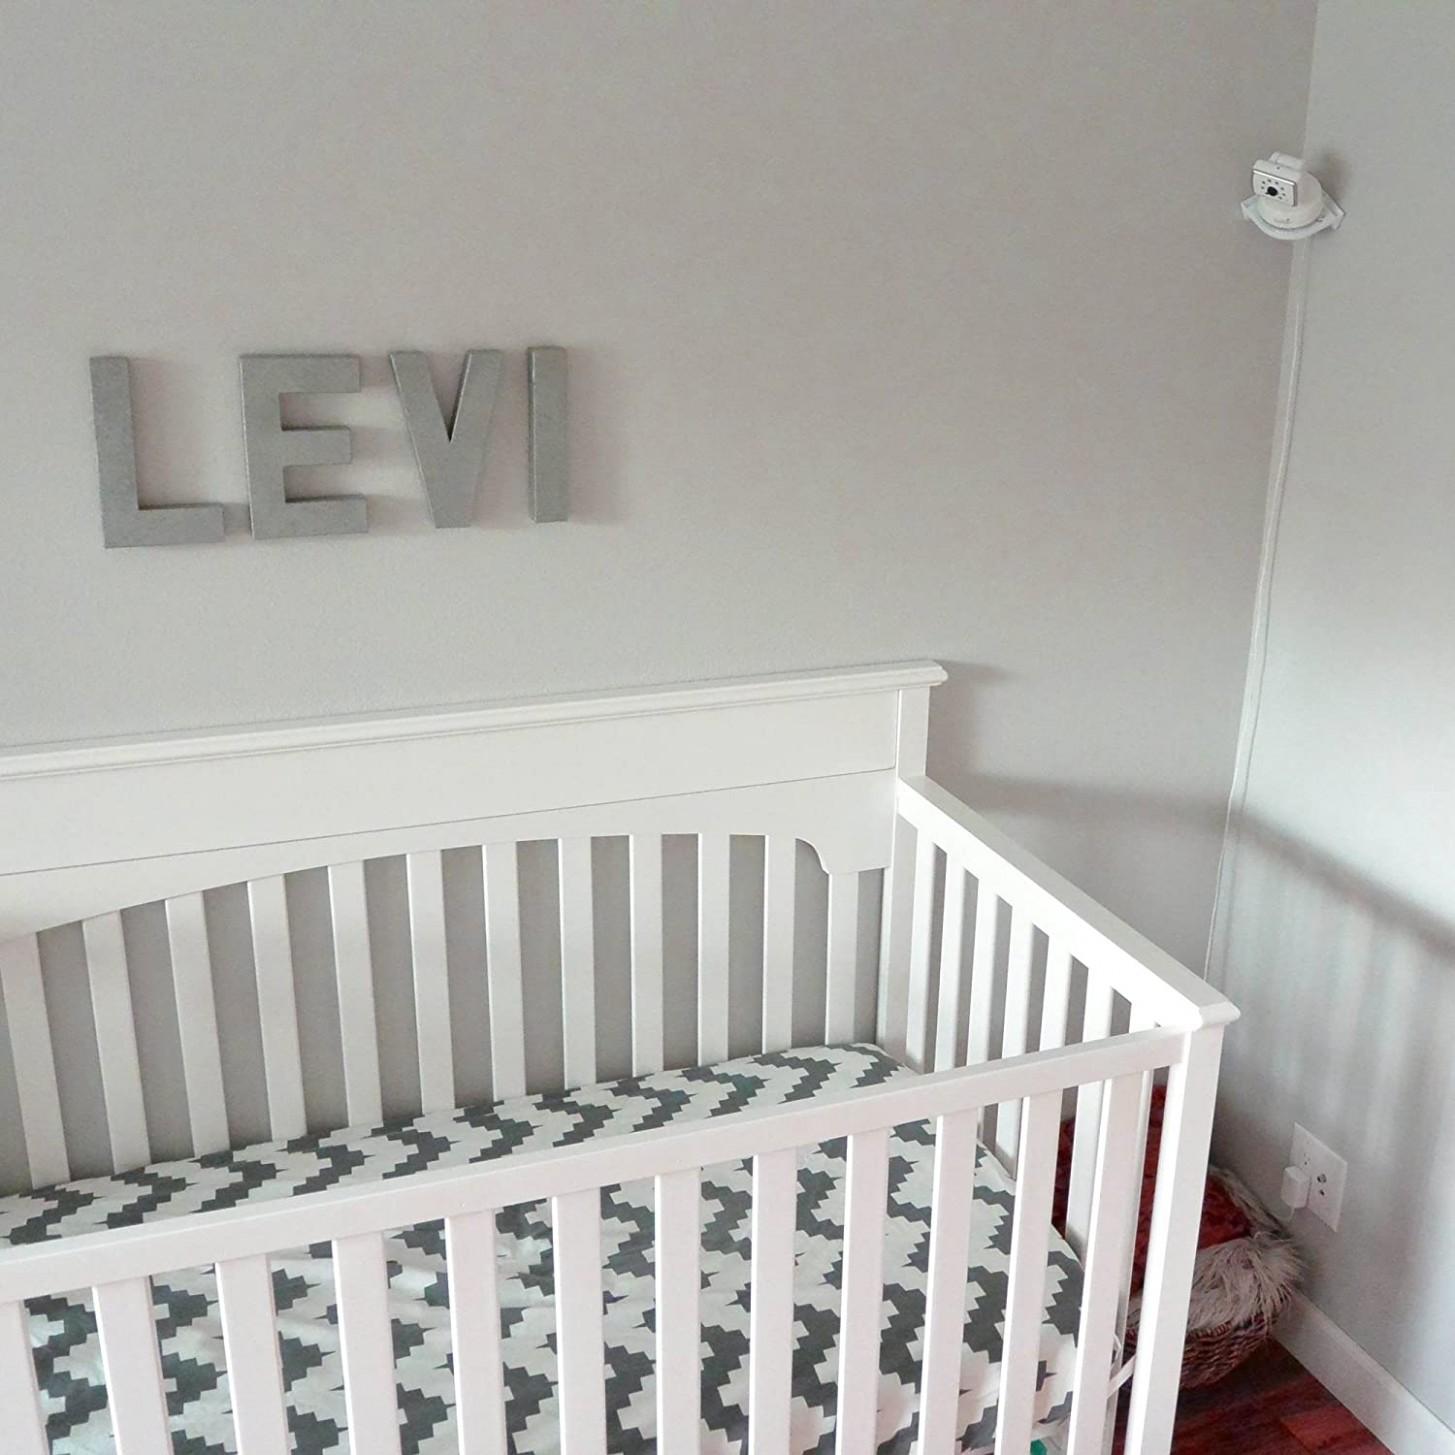 Vusee - The Universal Baby Monitor Shelf - White - Baby Room Monitor